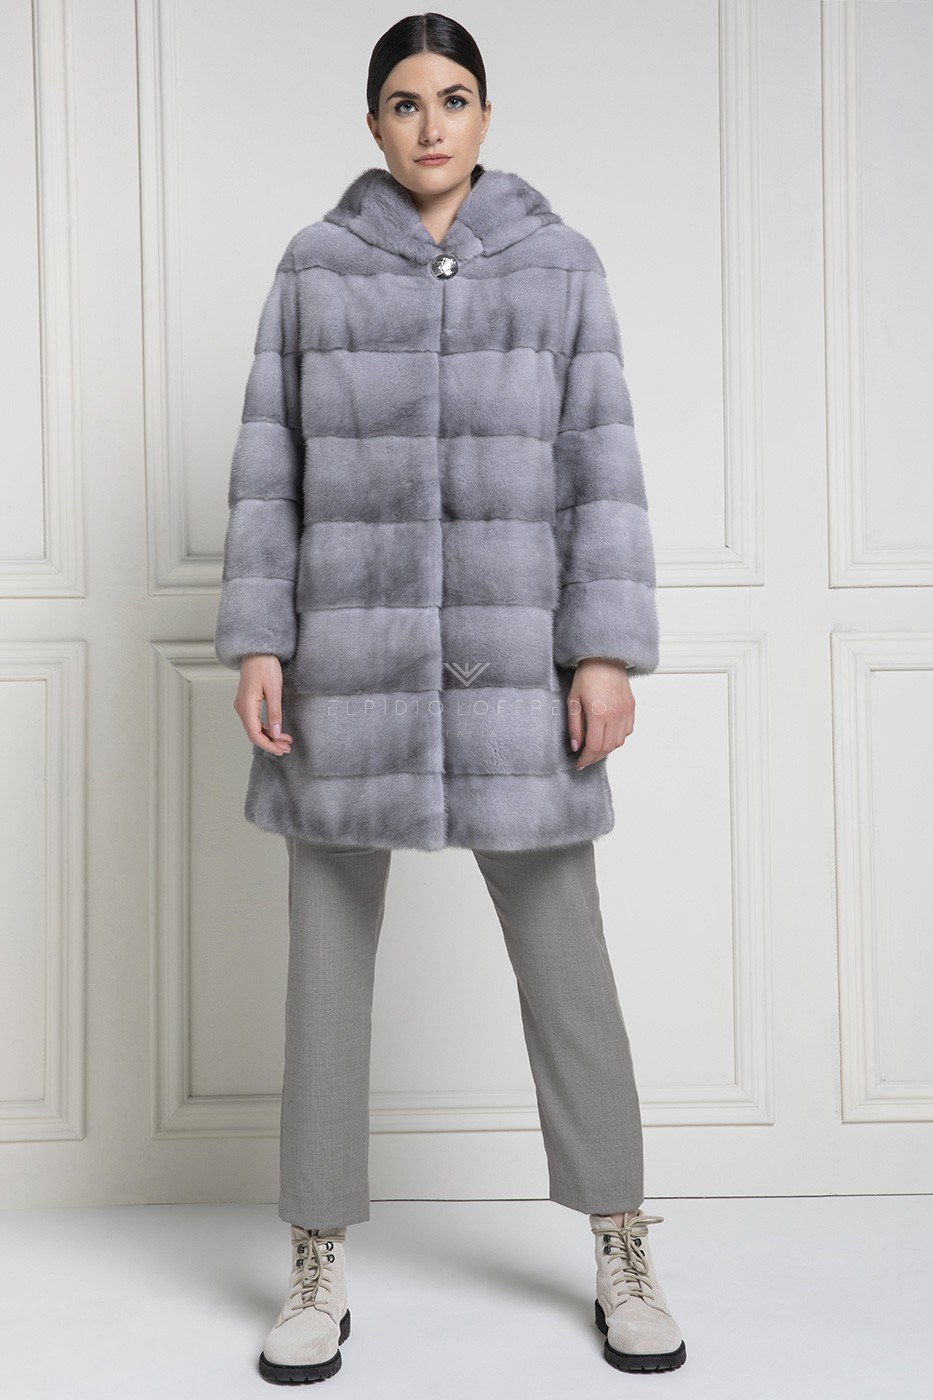 Sapphire Mink Coat with Hood - Length 85 cm